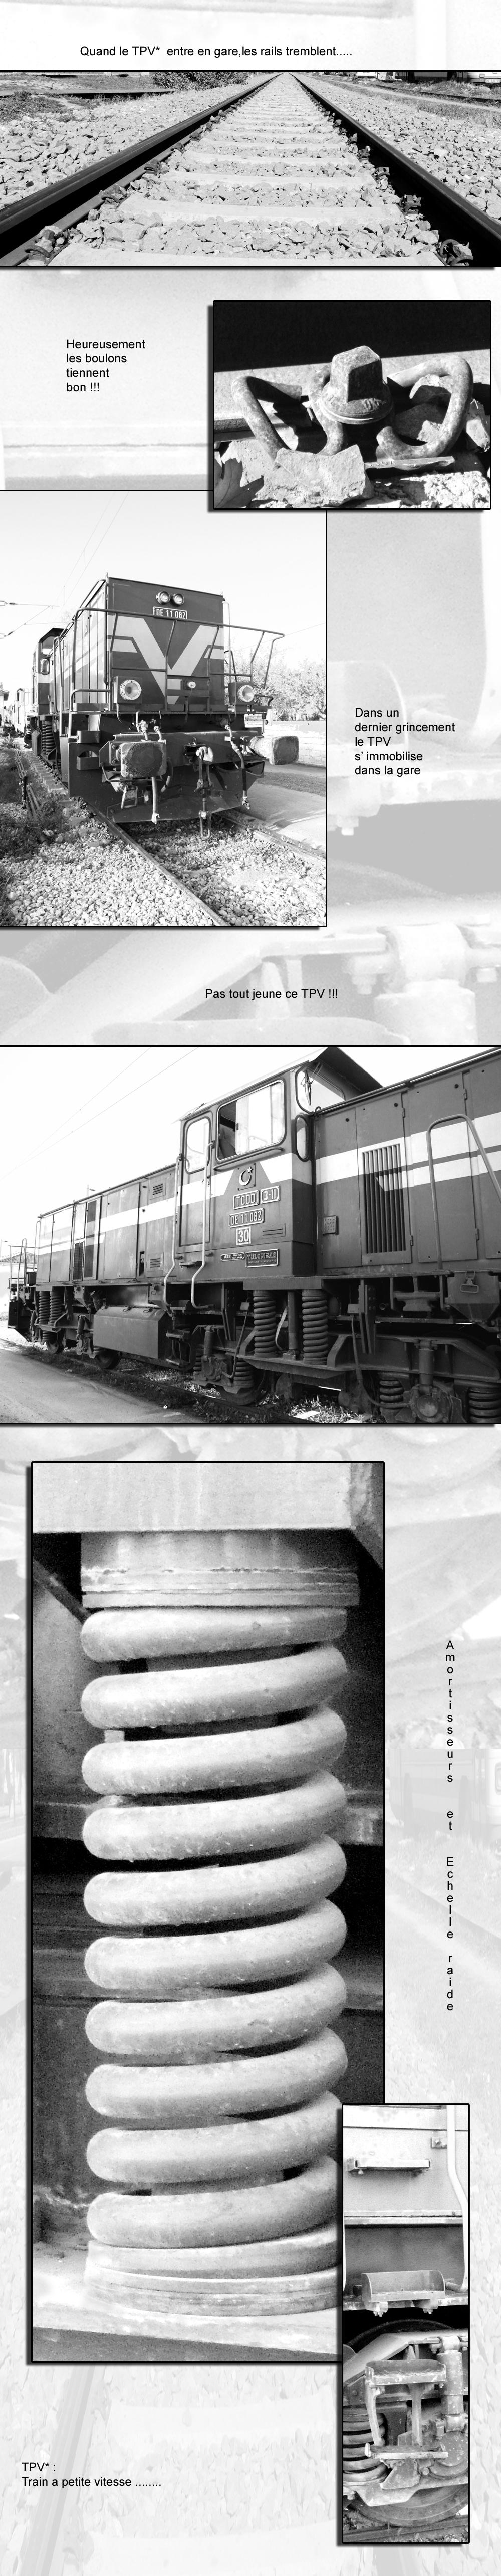 Train à petite vitesse en gare